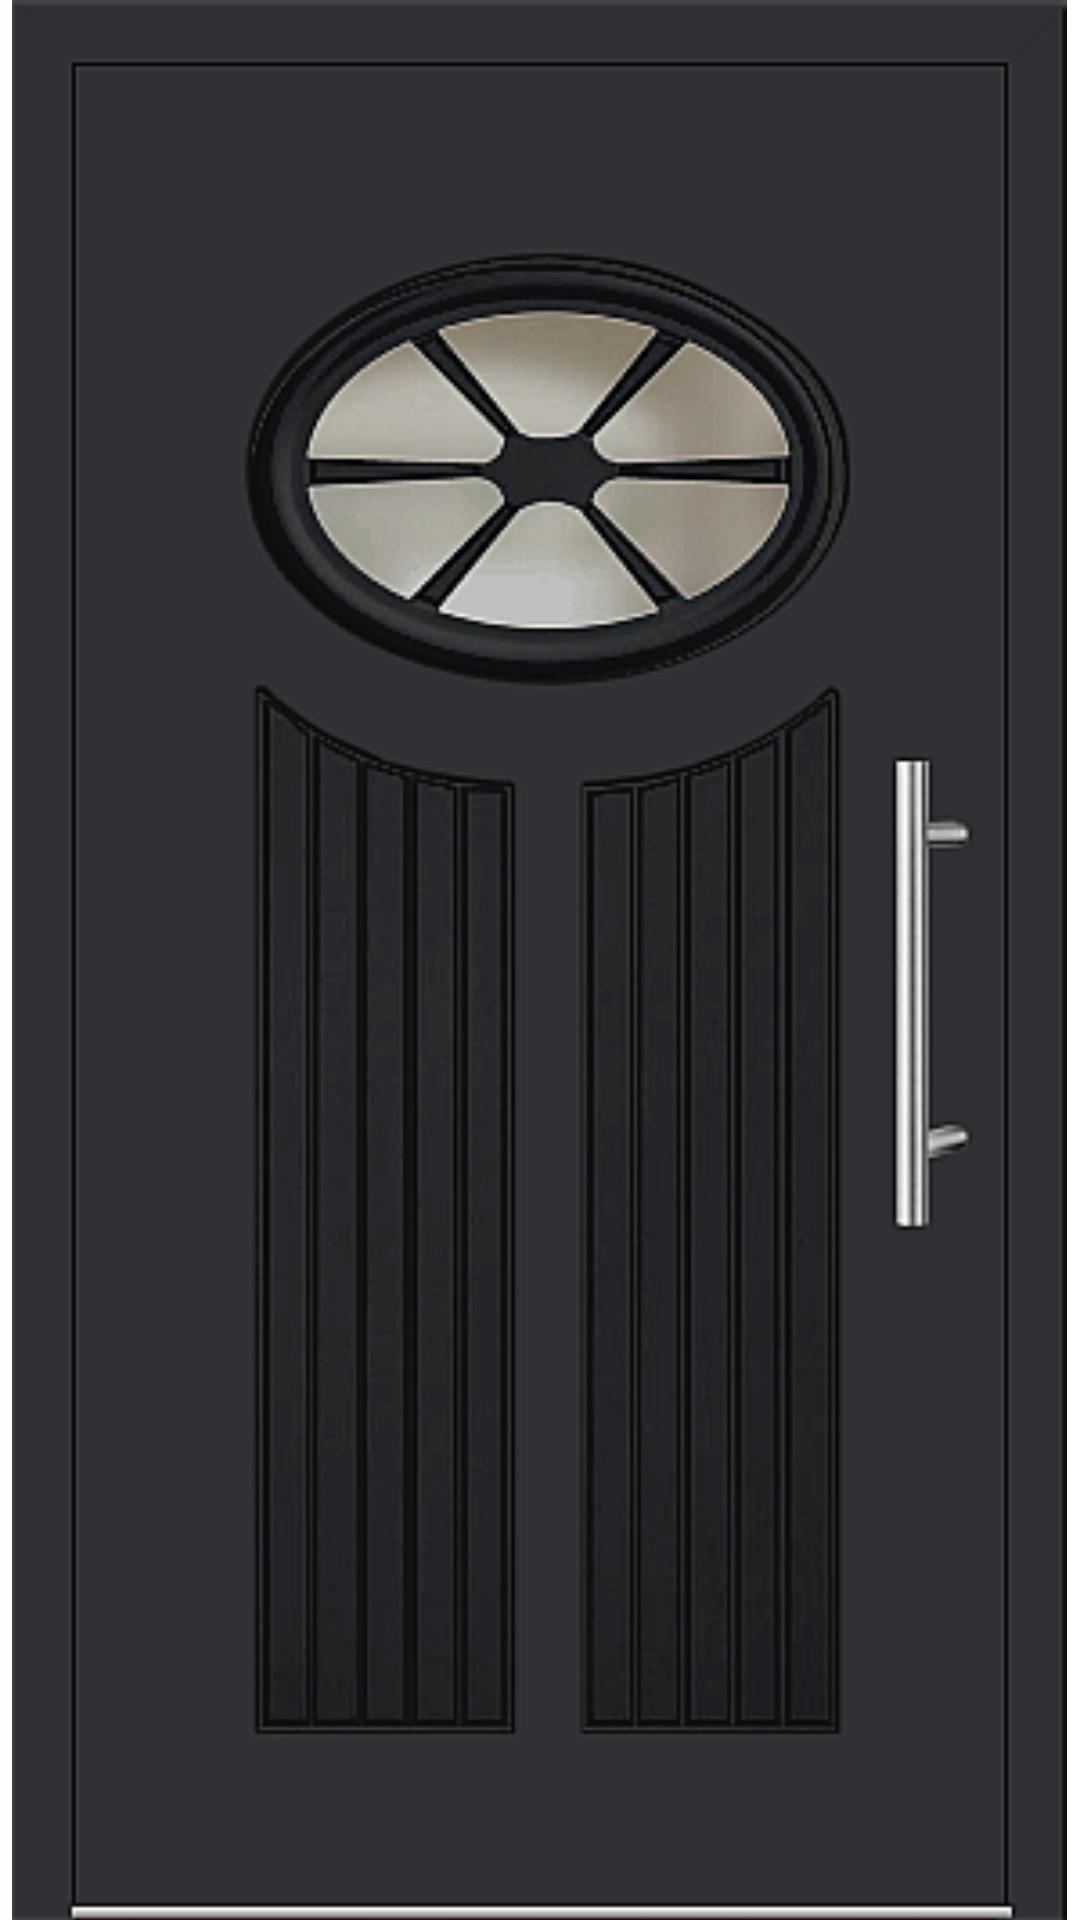 Aluminium Haustür Modell 25-11 schwarz